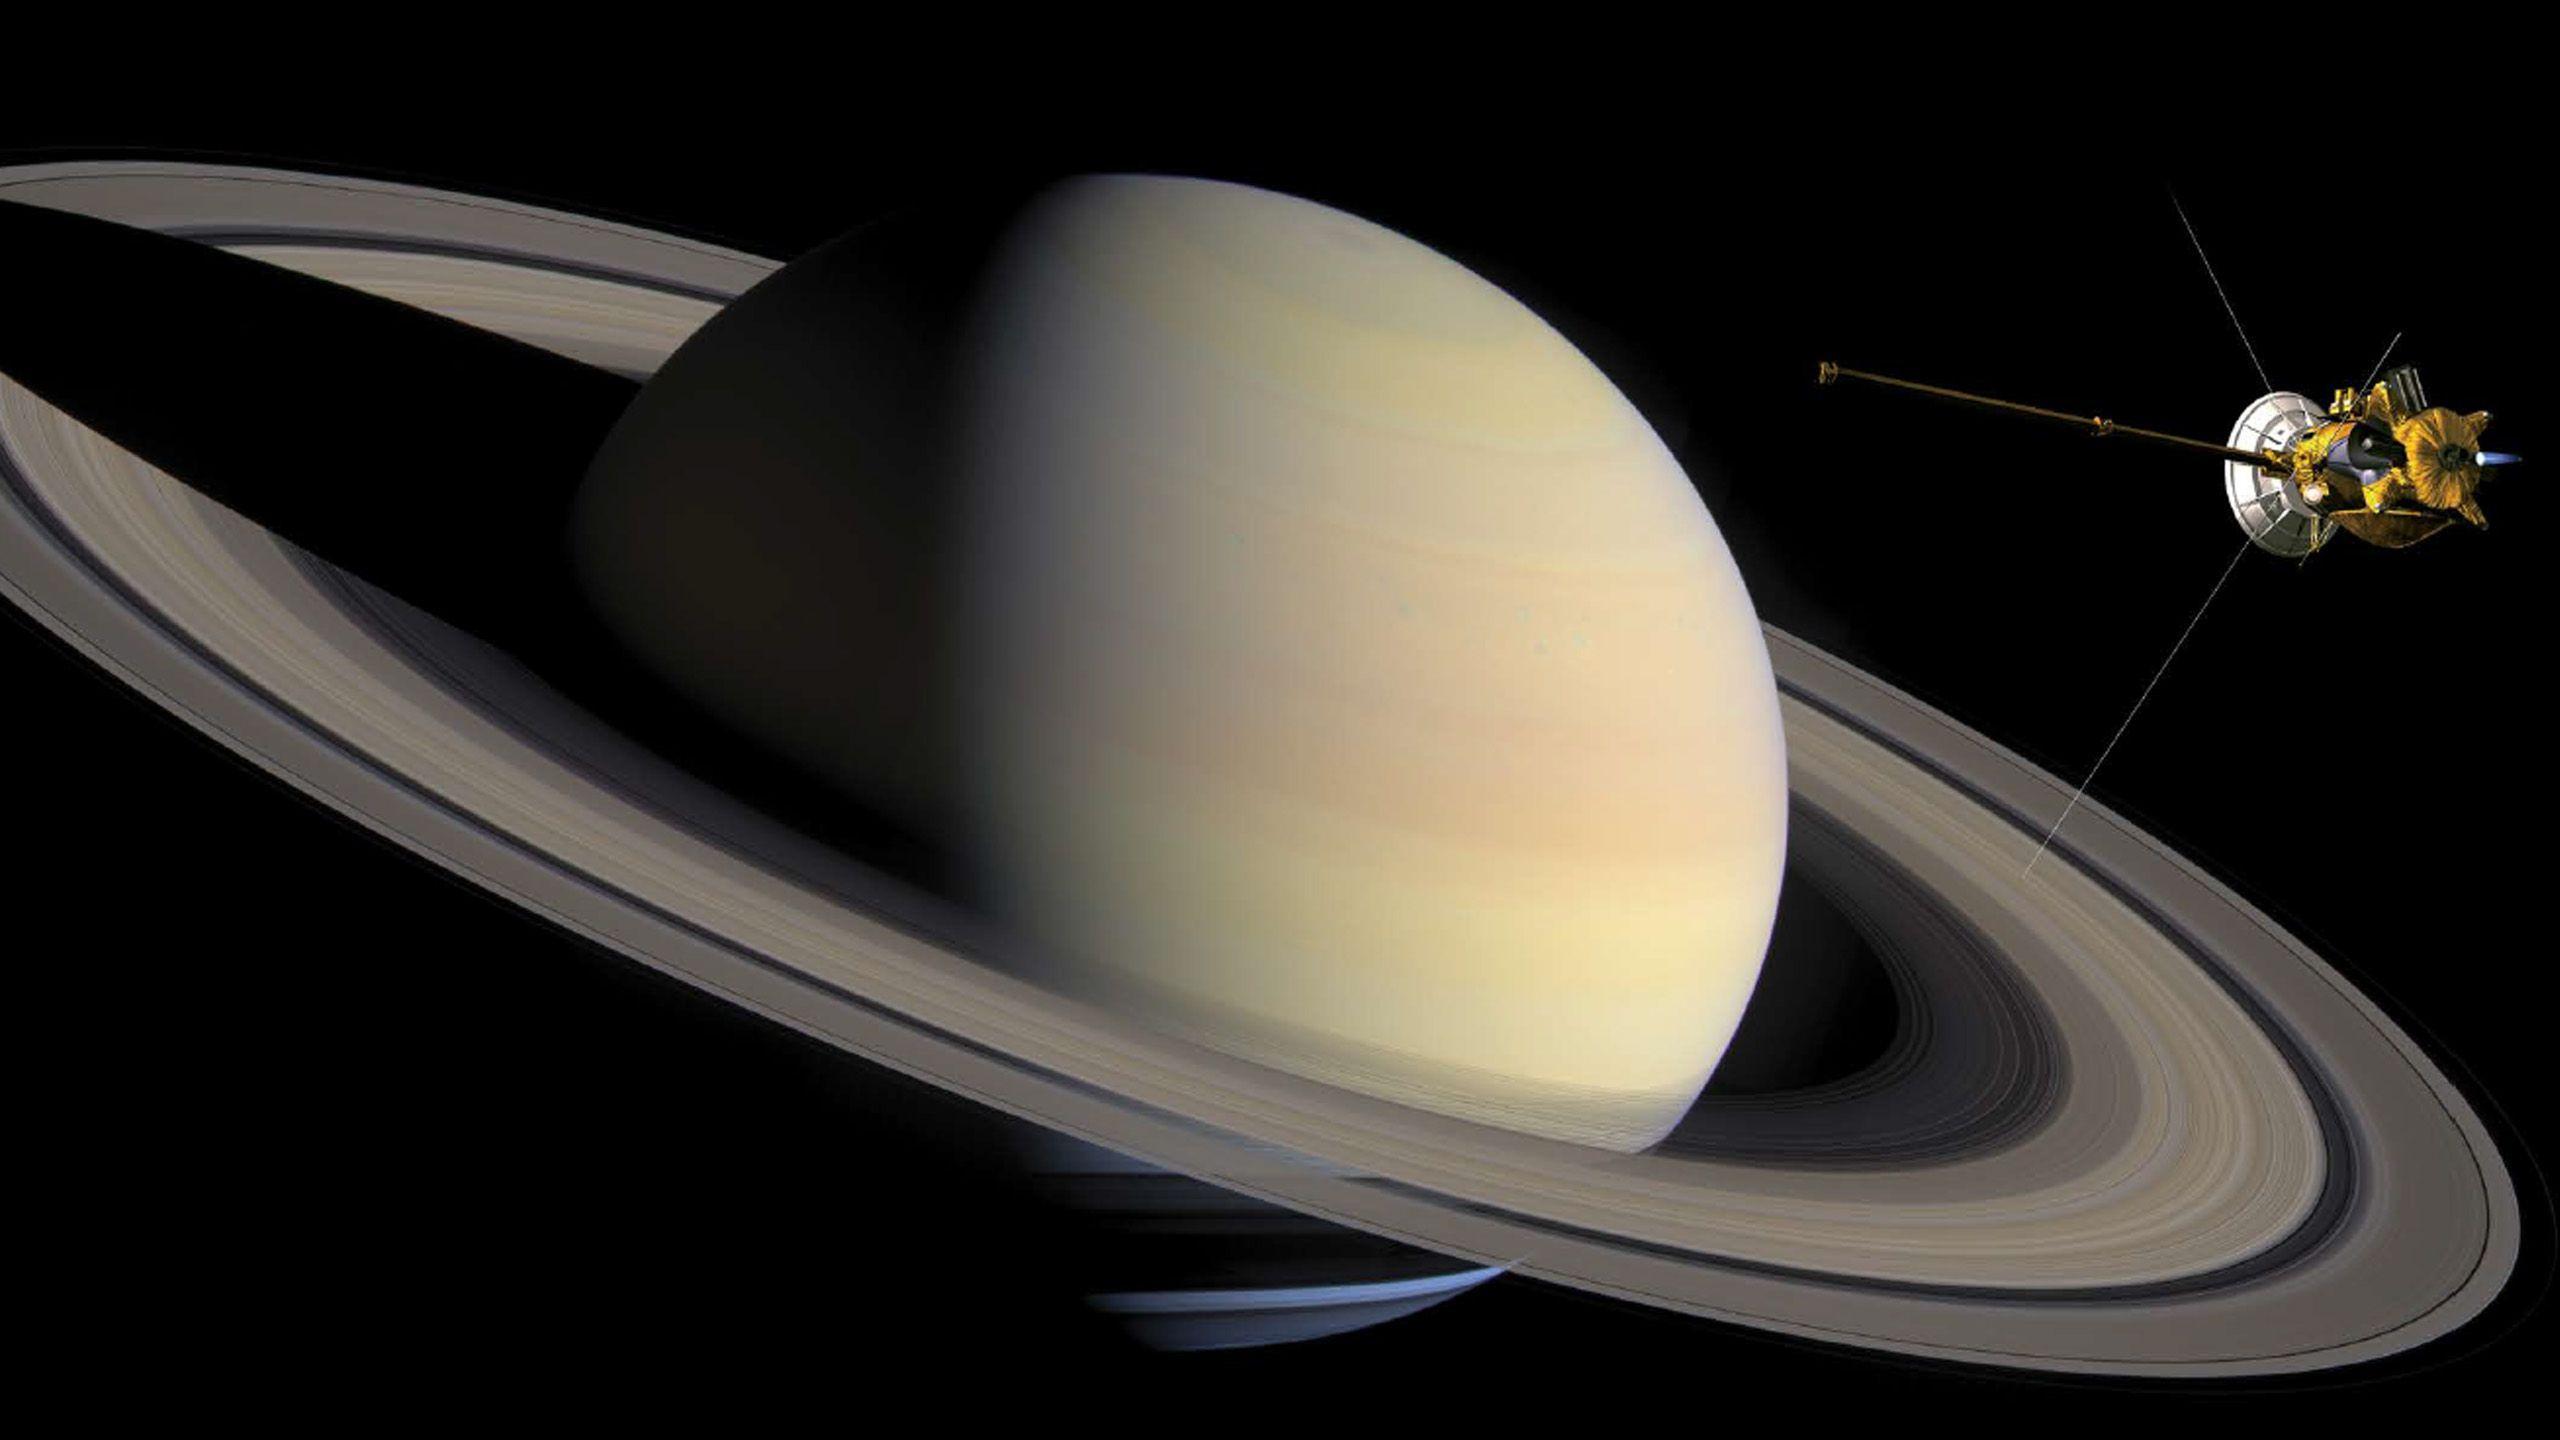 кассини гюйгенс фото сатурна звезды умеют